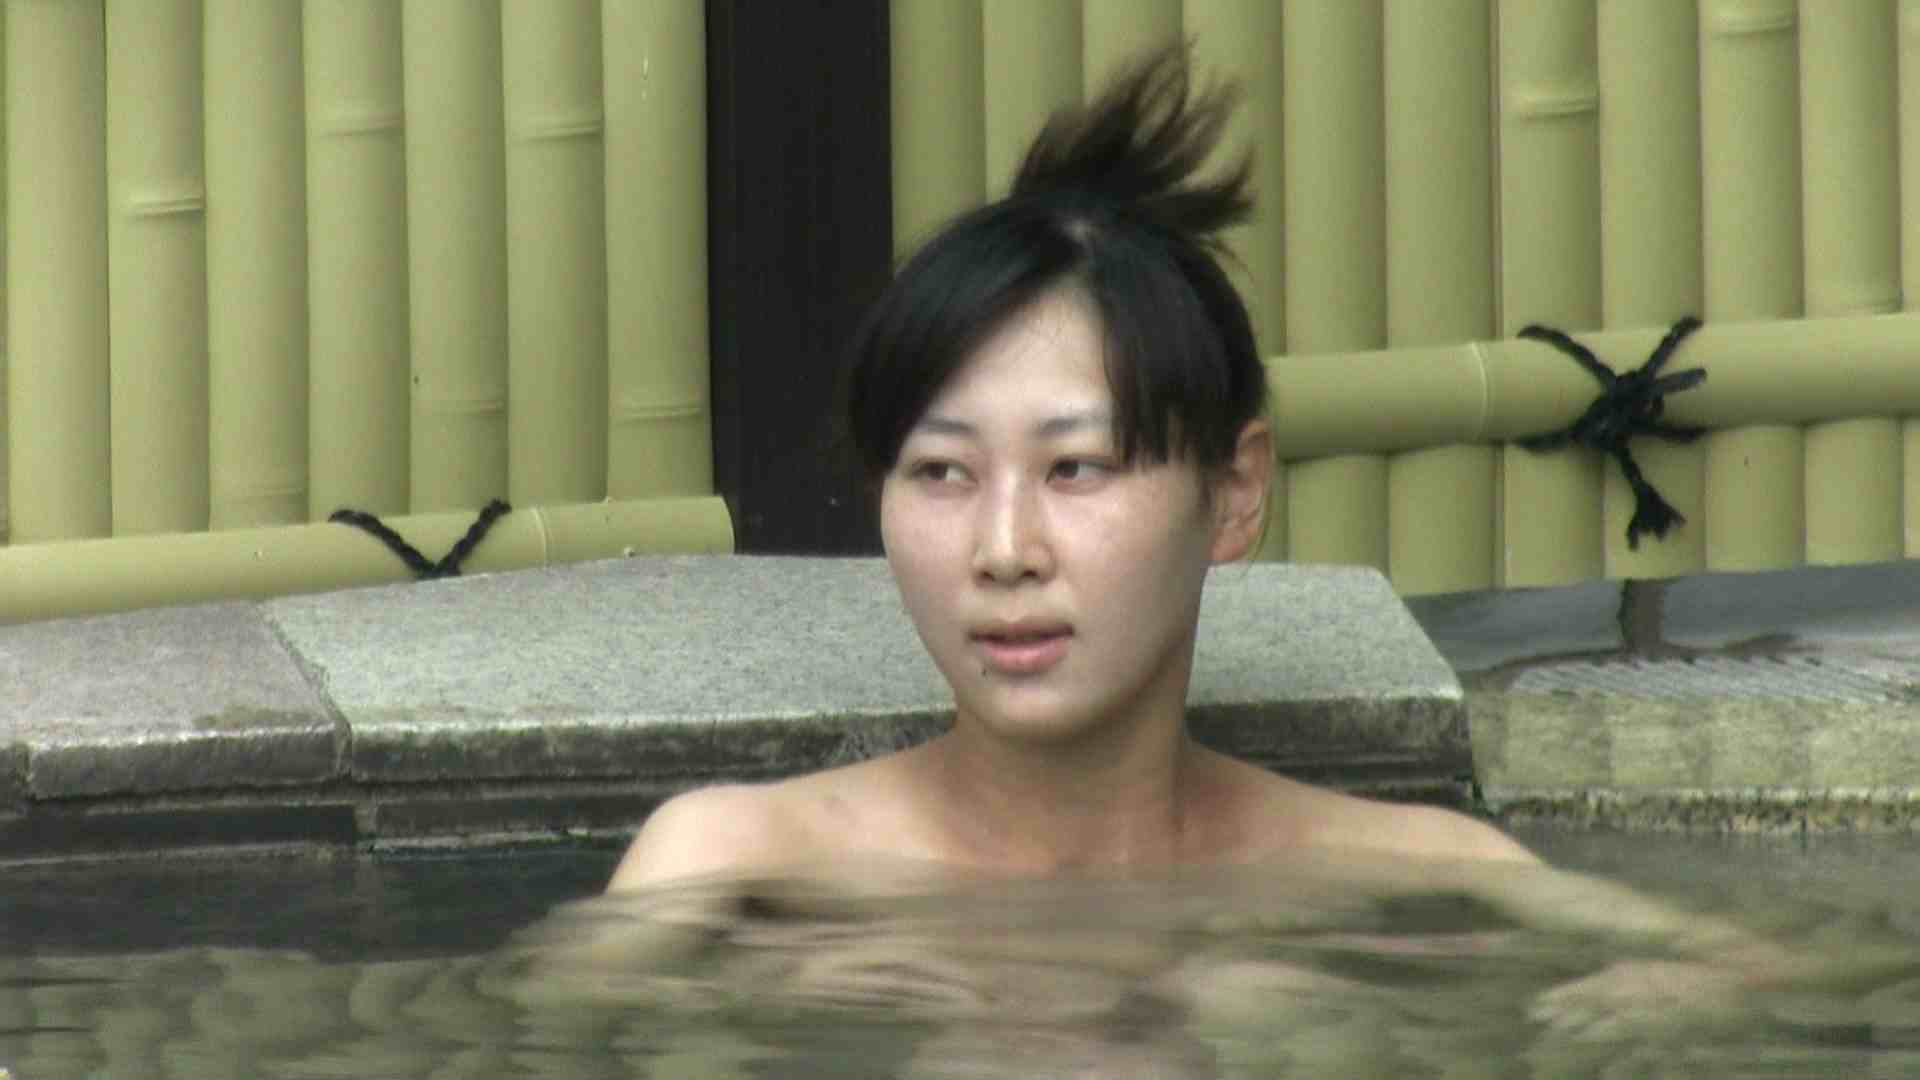 Aquaな露天風呂Vol.665 露天風呂編  86PIX 48